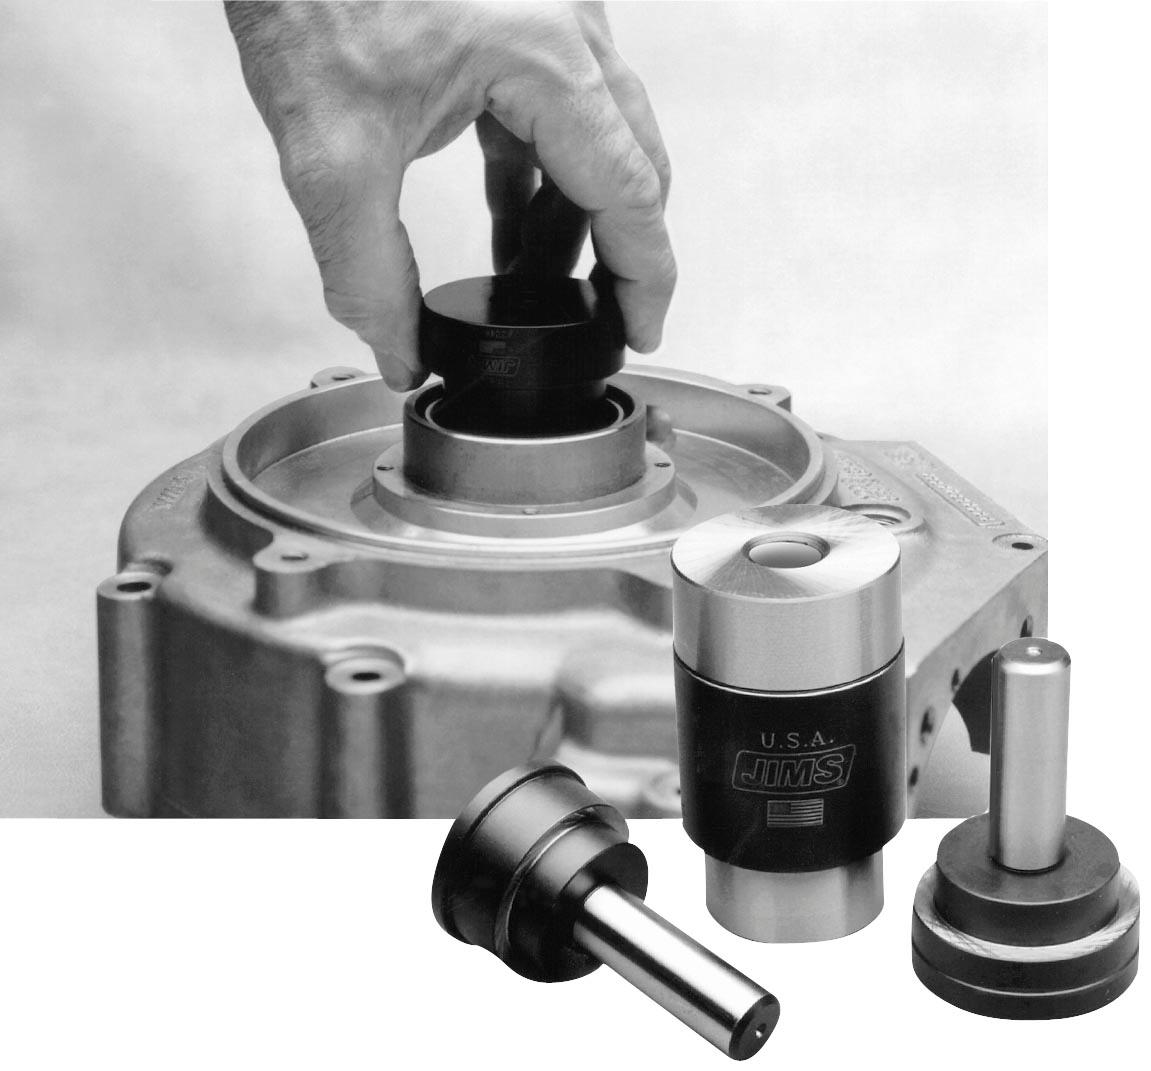 JIMS Timken Bearing Race Installer Tool - 2246